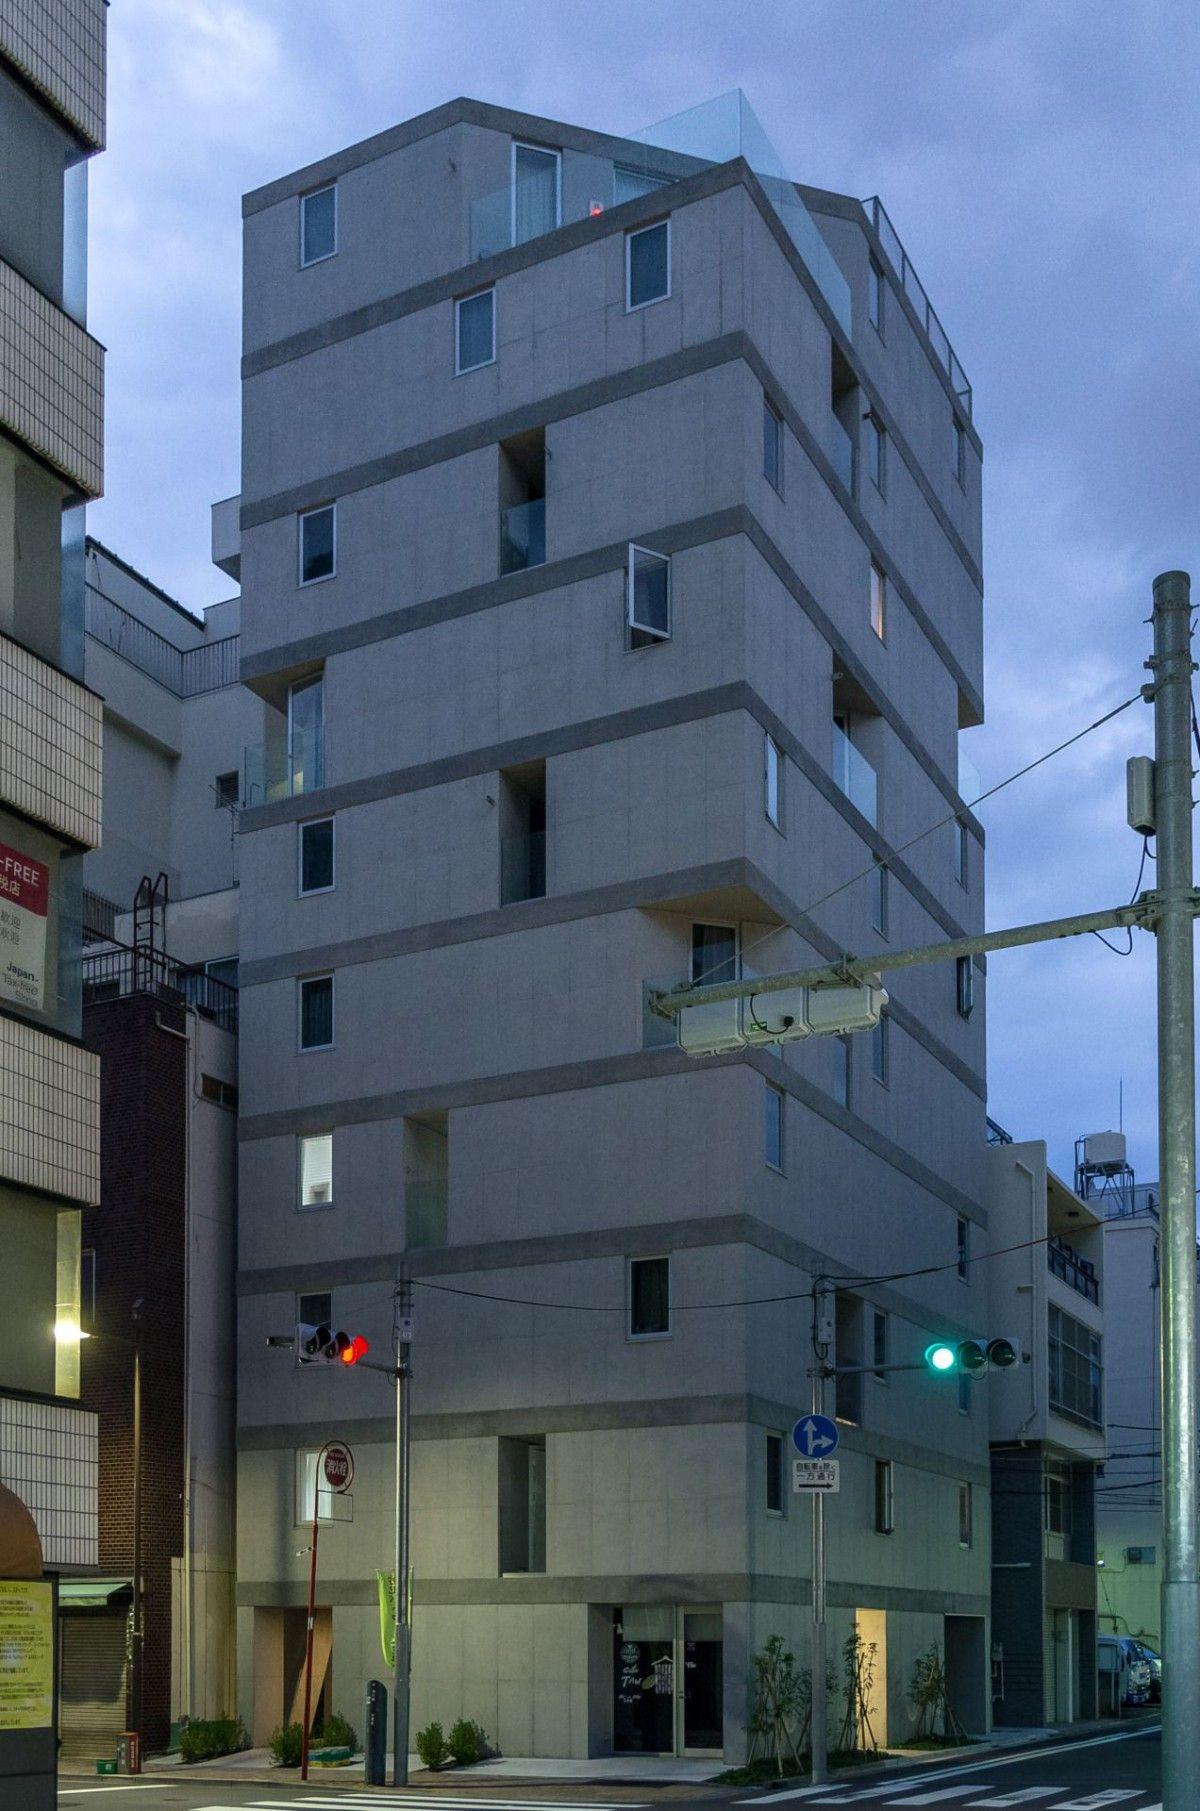 10bf7f5bfea6d4bc7c2b8e6d701add34 go hasegawa apartment in okachimachi tokyo (3) go hasegawa  at gsmportal.co